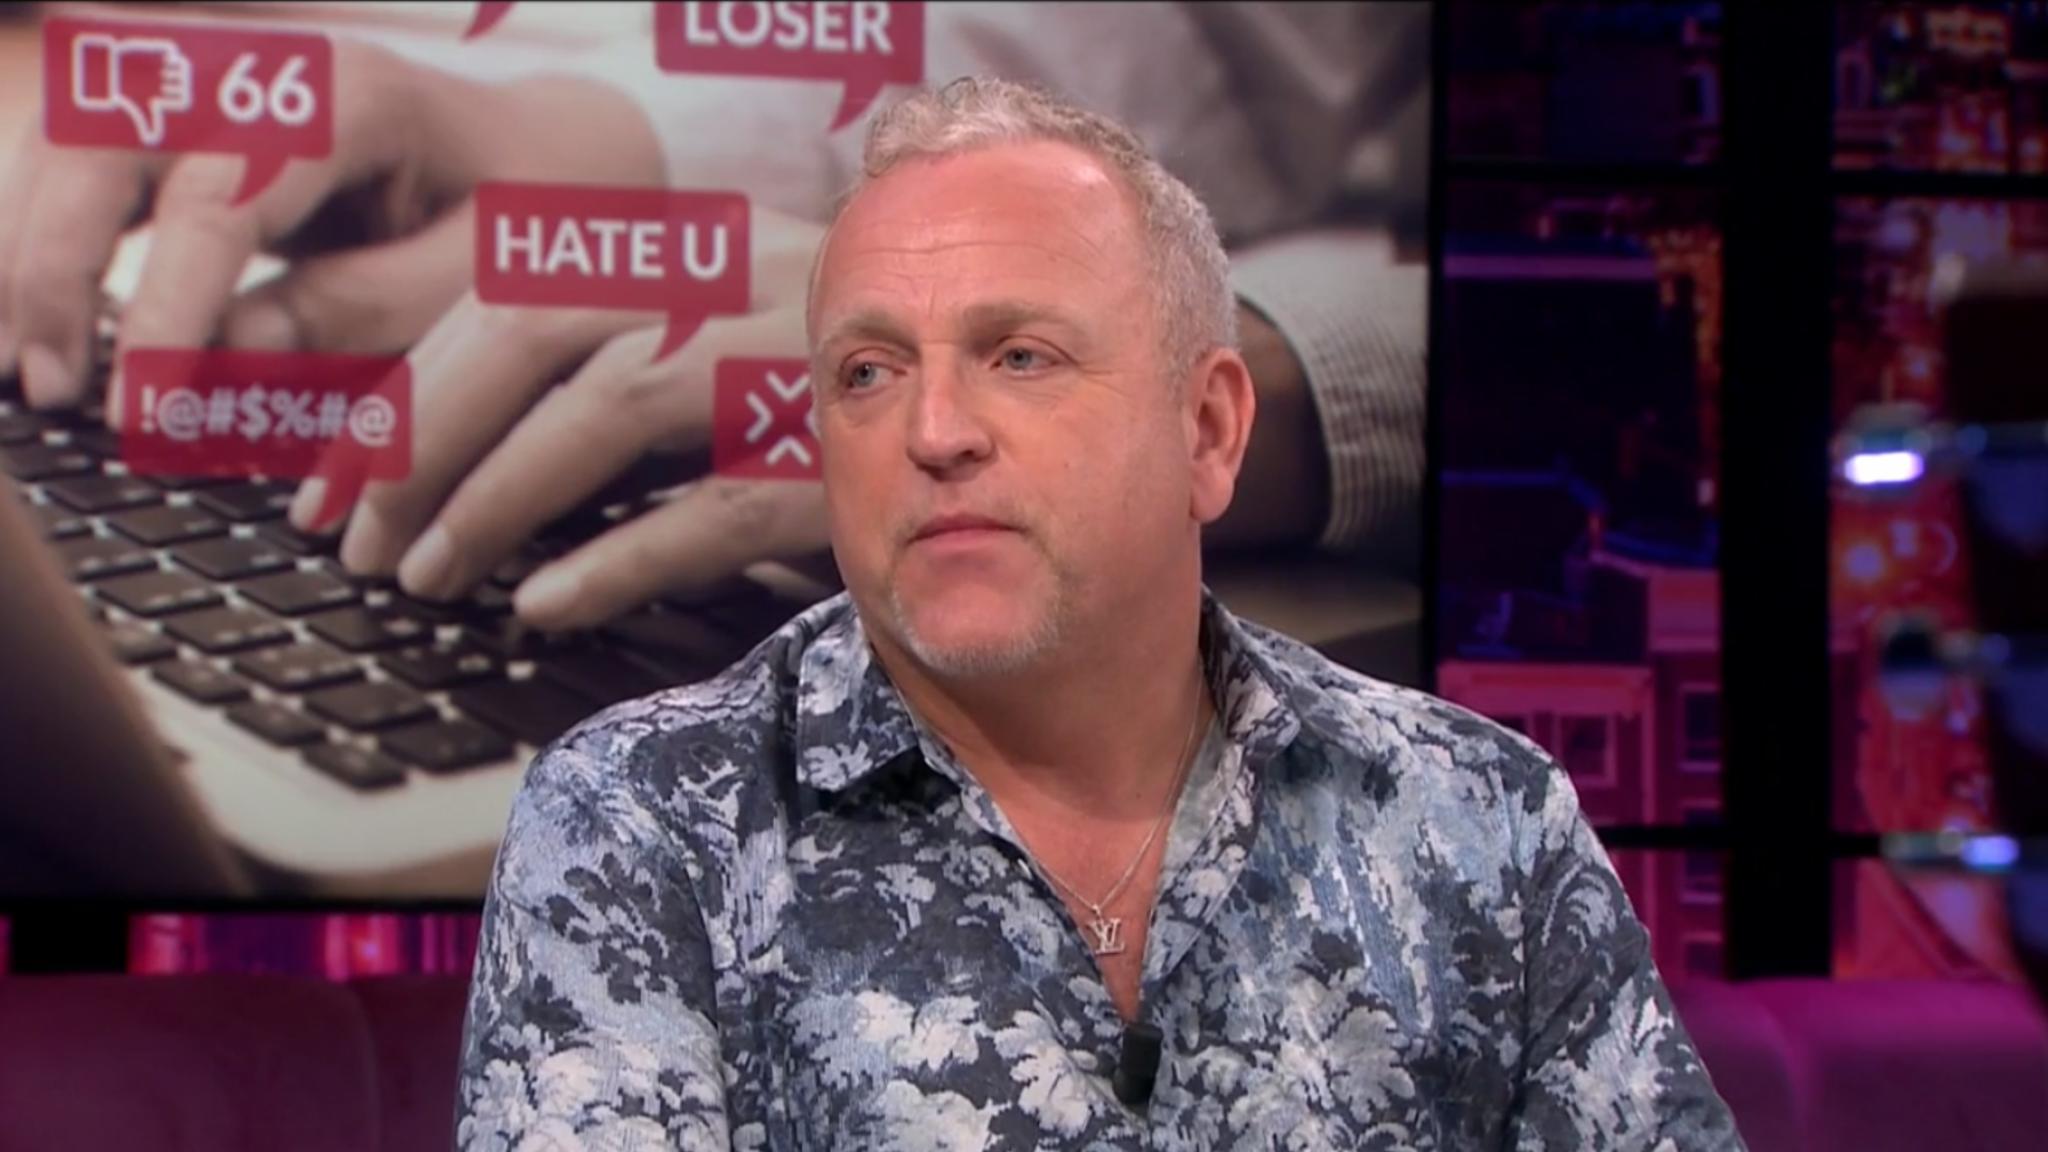 Gordon na overwinning Mediacourant: 'Mis de reacties stiekem wel' - RTL Boulevard